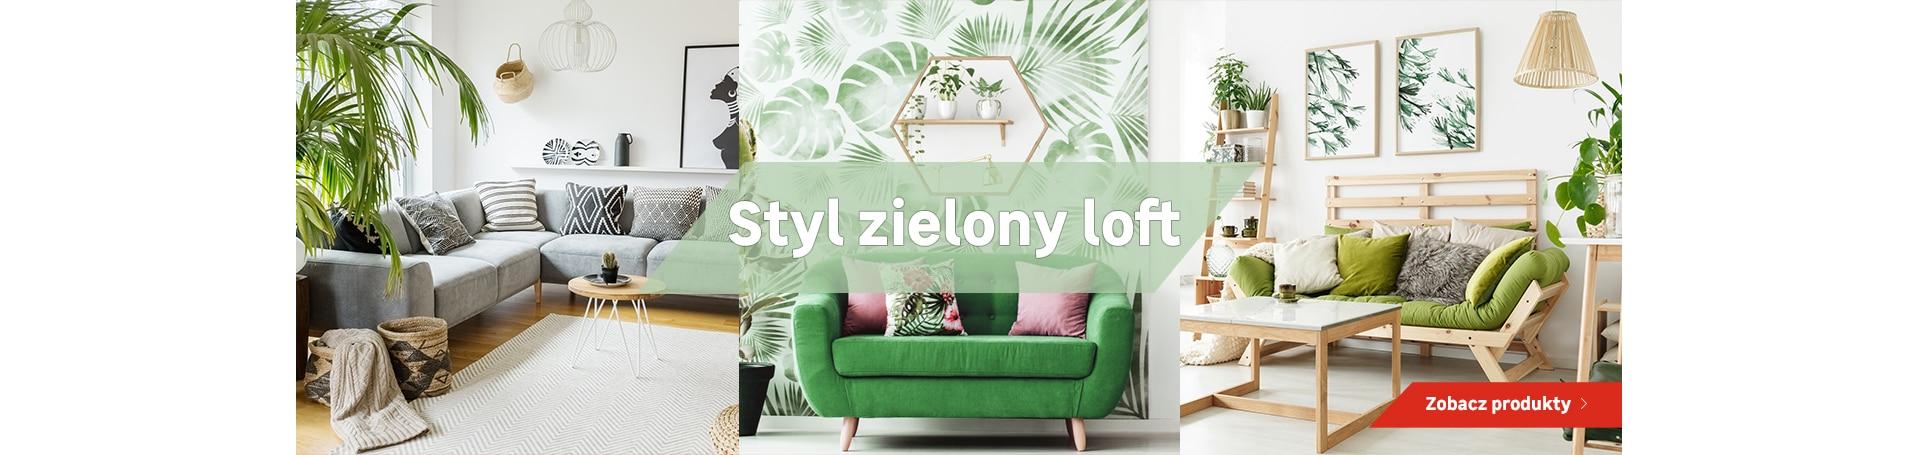 rr-zielony-loft-1323x455-10.04-13.05.2019